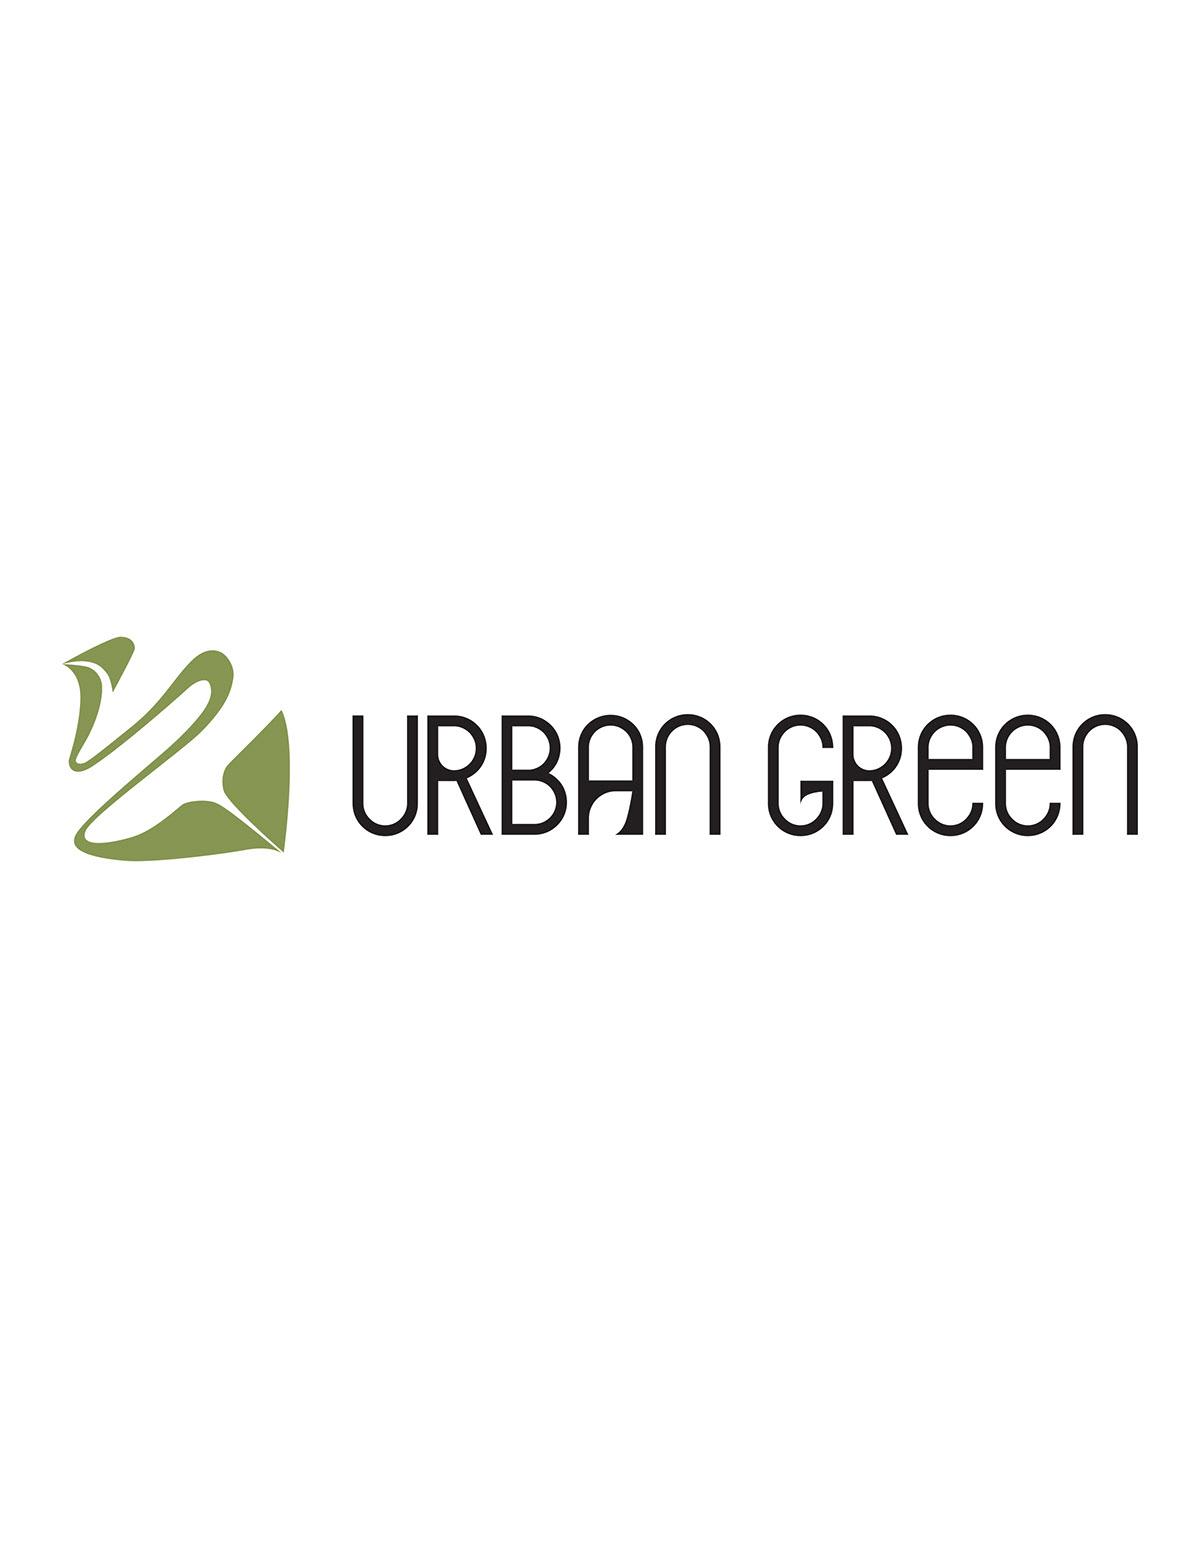 Urban Green Organic Cafe Logo Branding On Behance